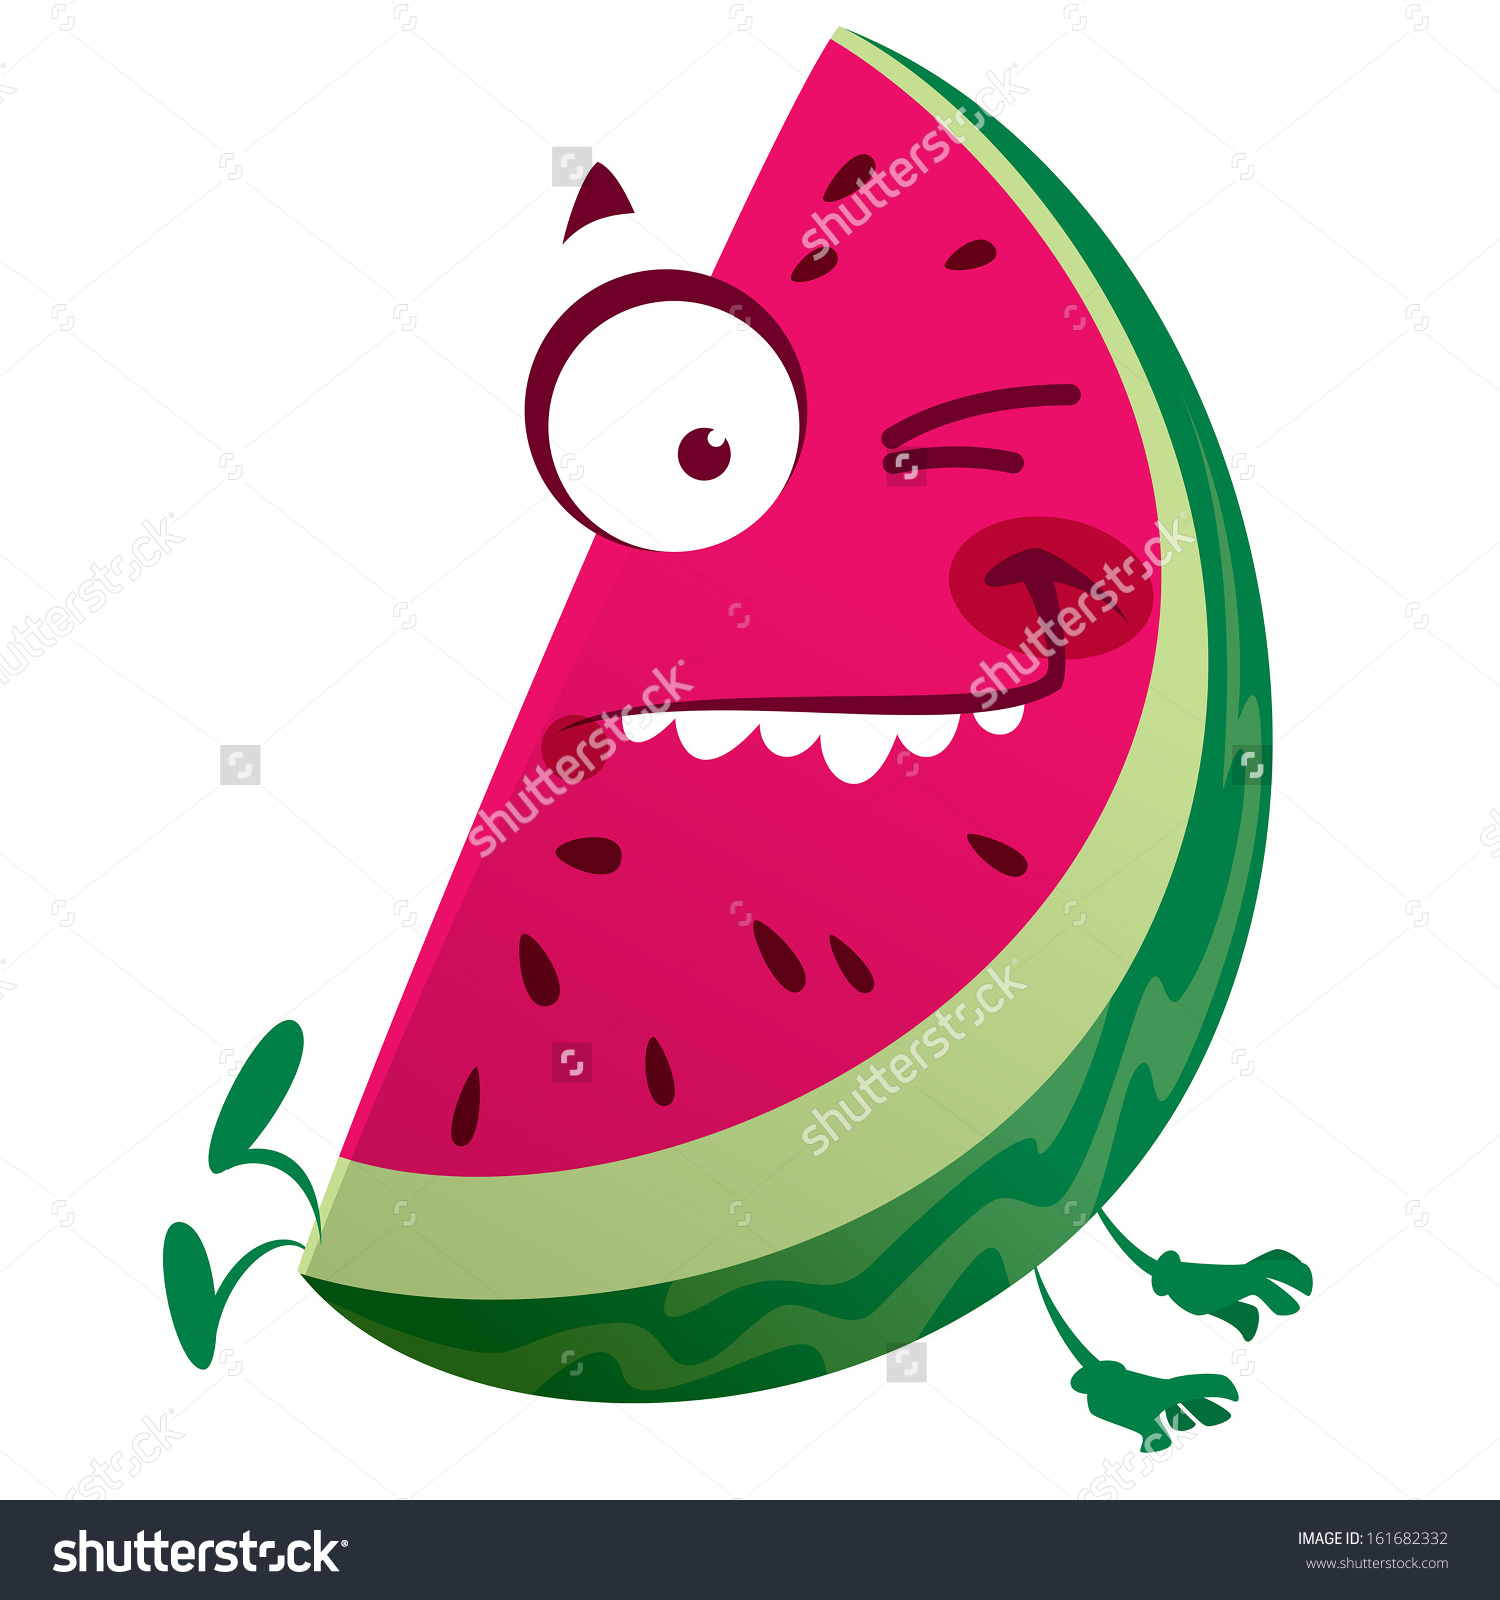 Cartoon Pink Red Watermelon Fruit Character Stock Vector 161682332.